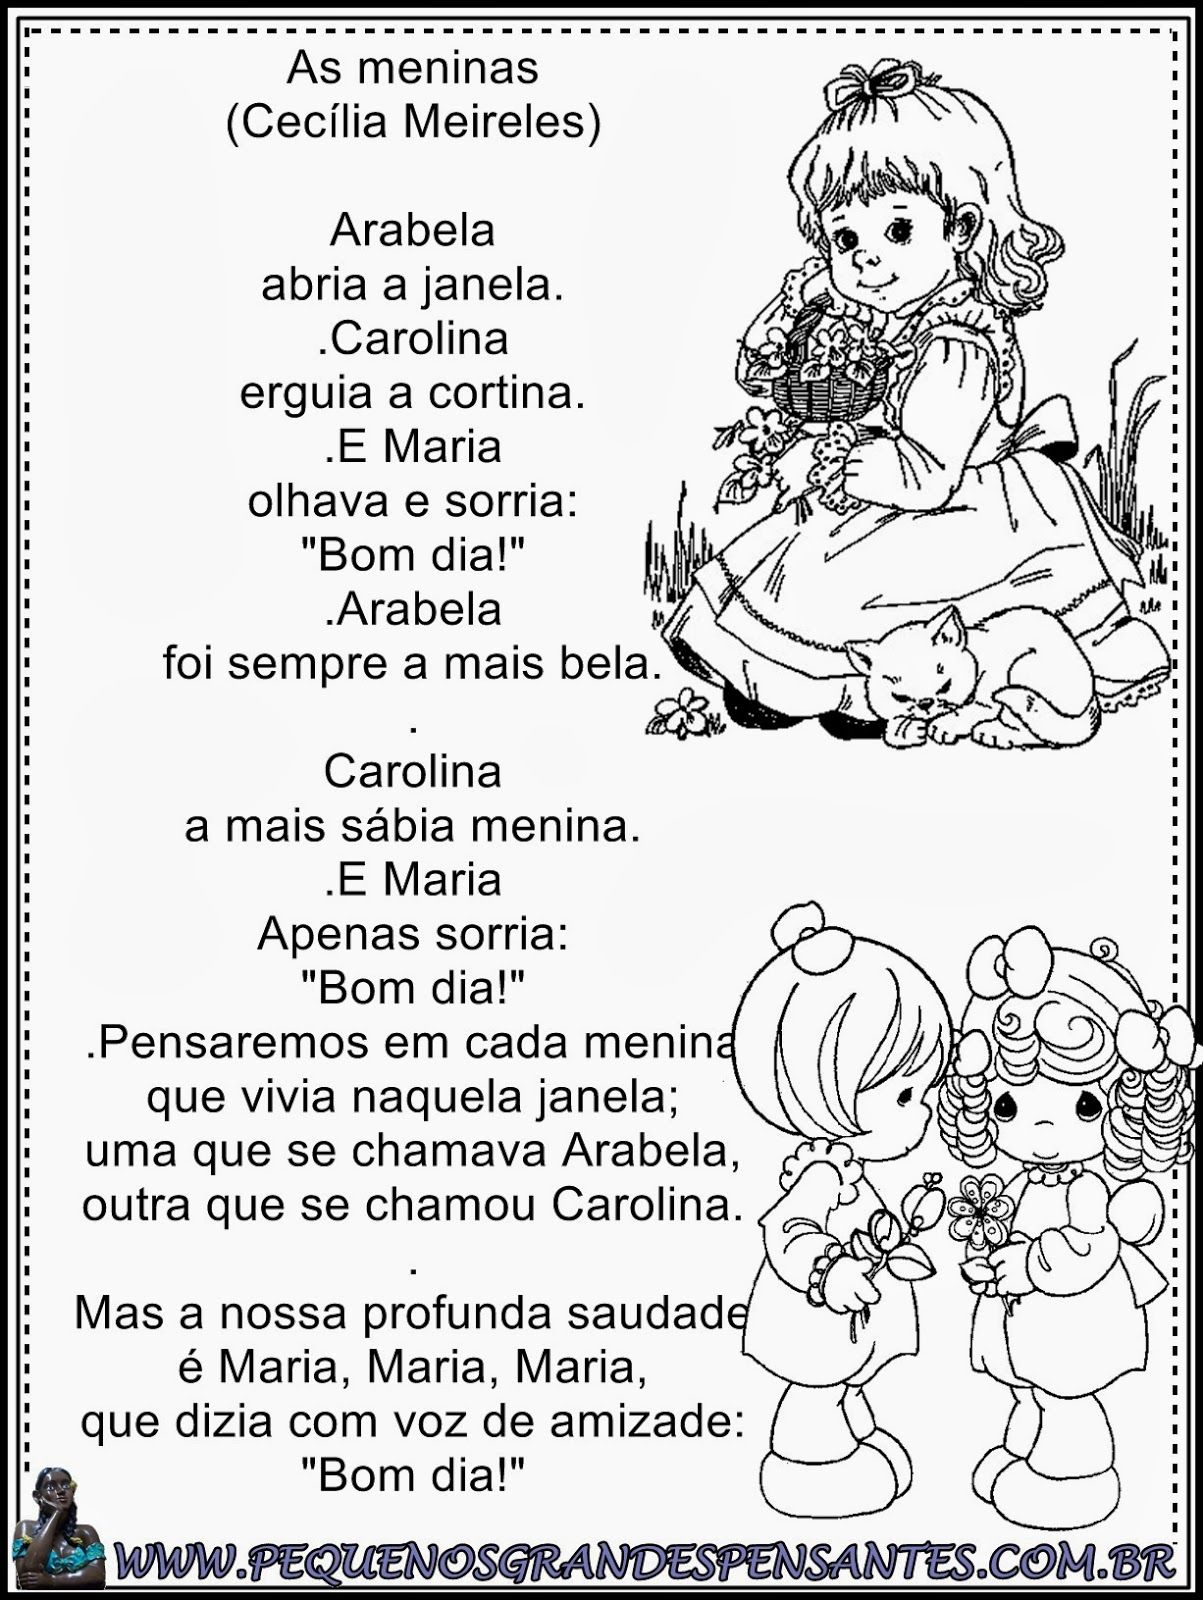 Top poema as meninas cecília meireles - Pesquisa Google   Coisas para  LY68